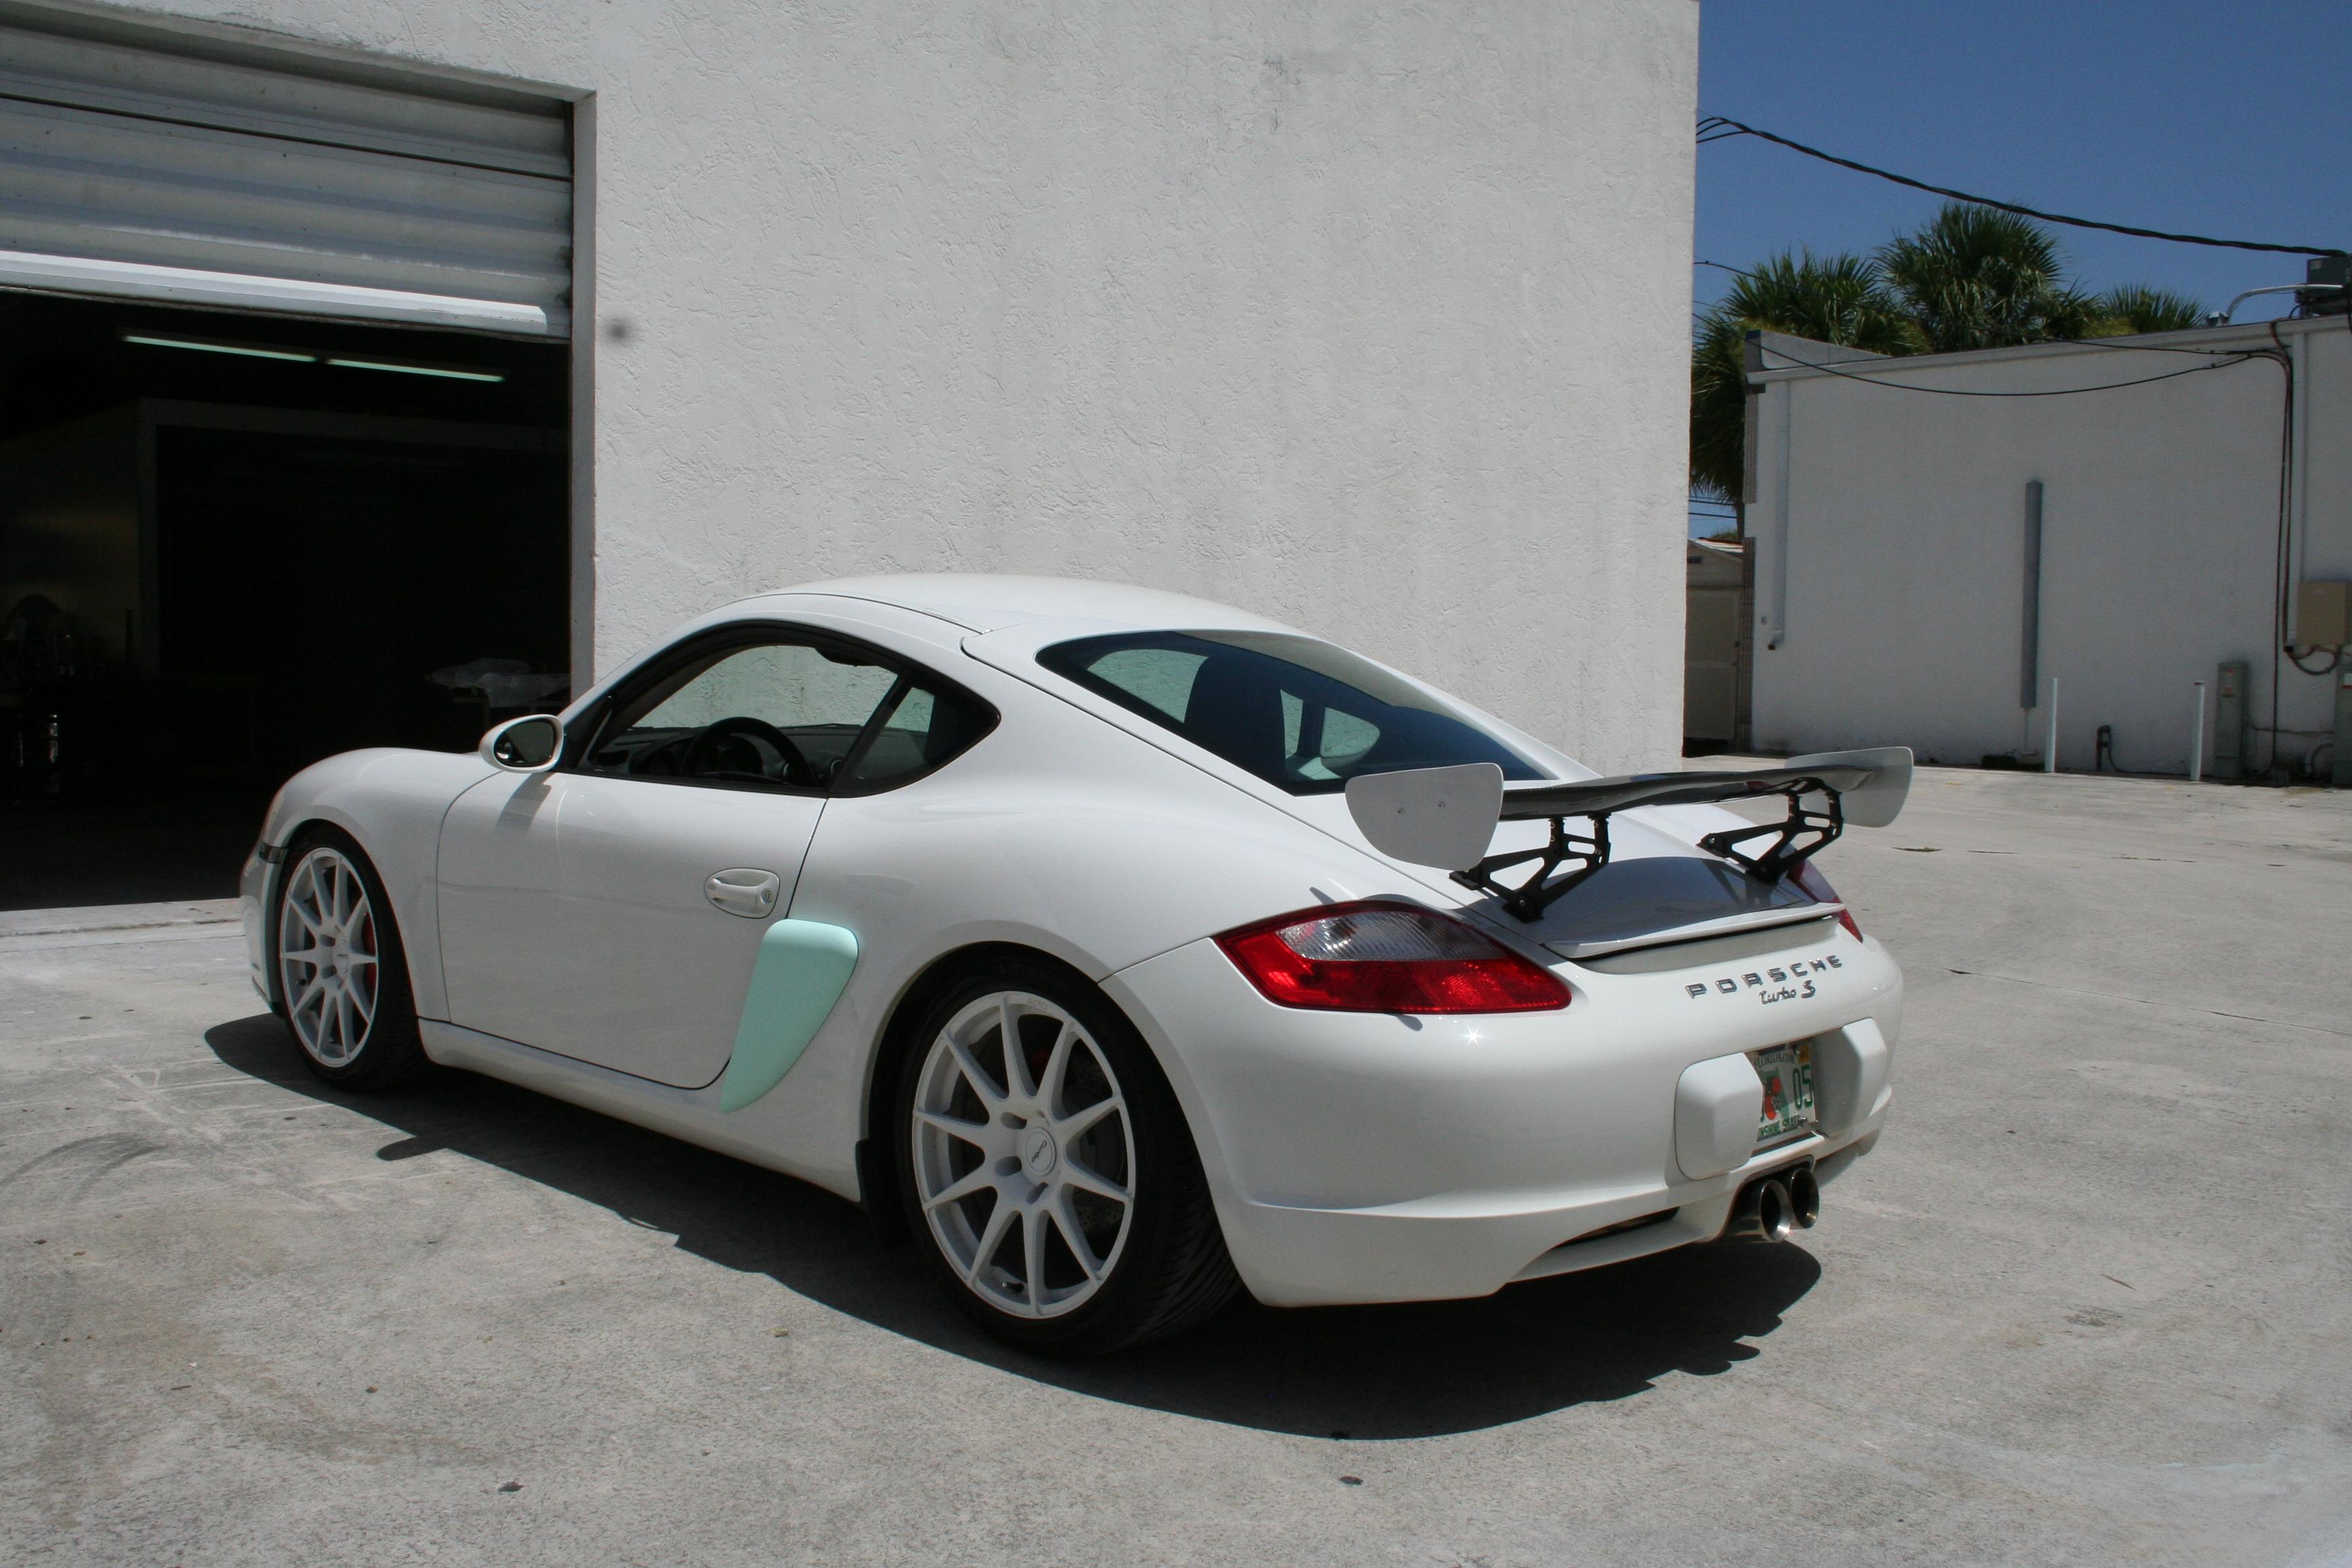 Porsche Cayman I (987) 2005 - 2009 Coupe #2